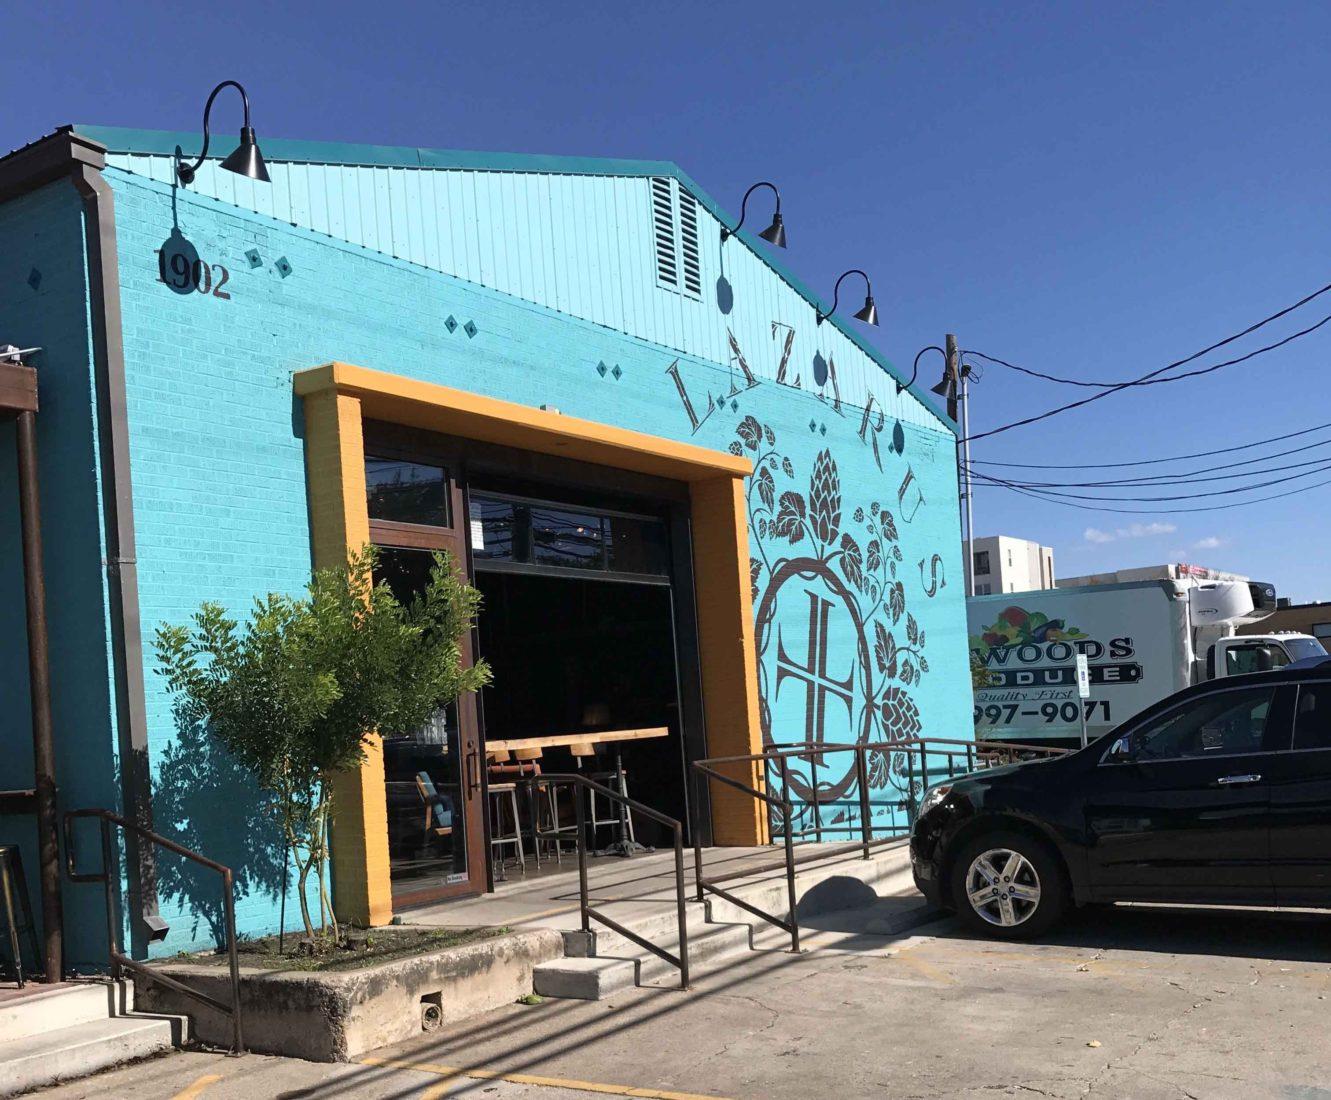 346. Lazarus Brewing Co, Austin TX, 2017